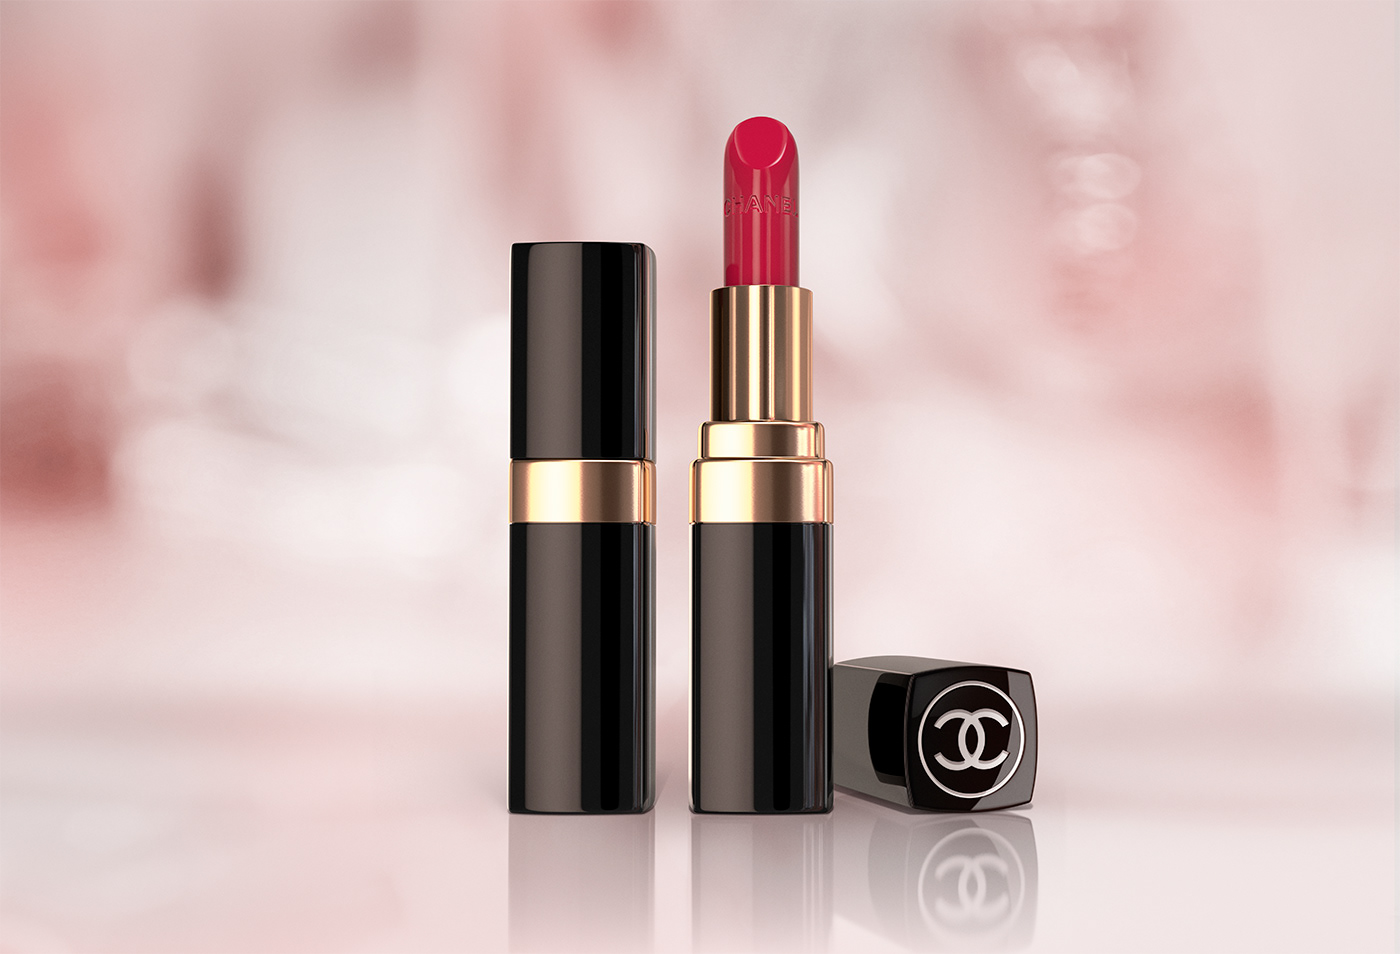 3D CGI vray Visualising chanel lipstick beauty Make Up product